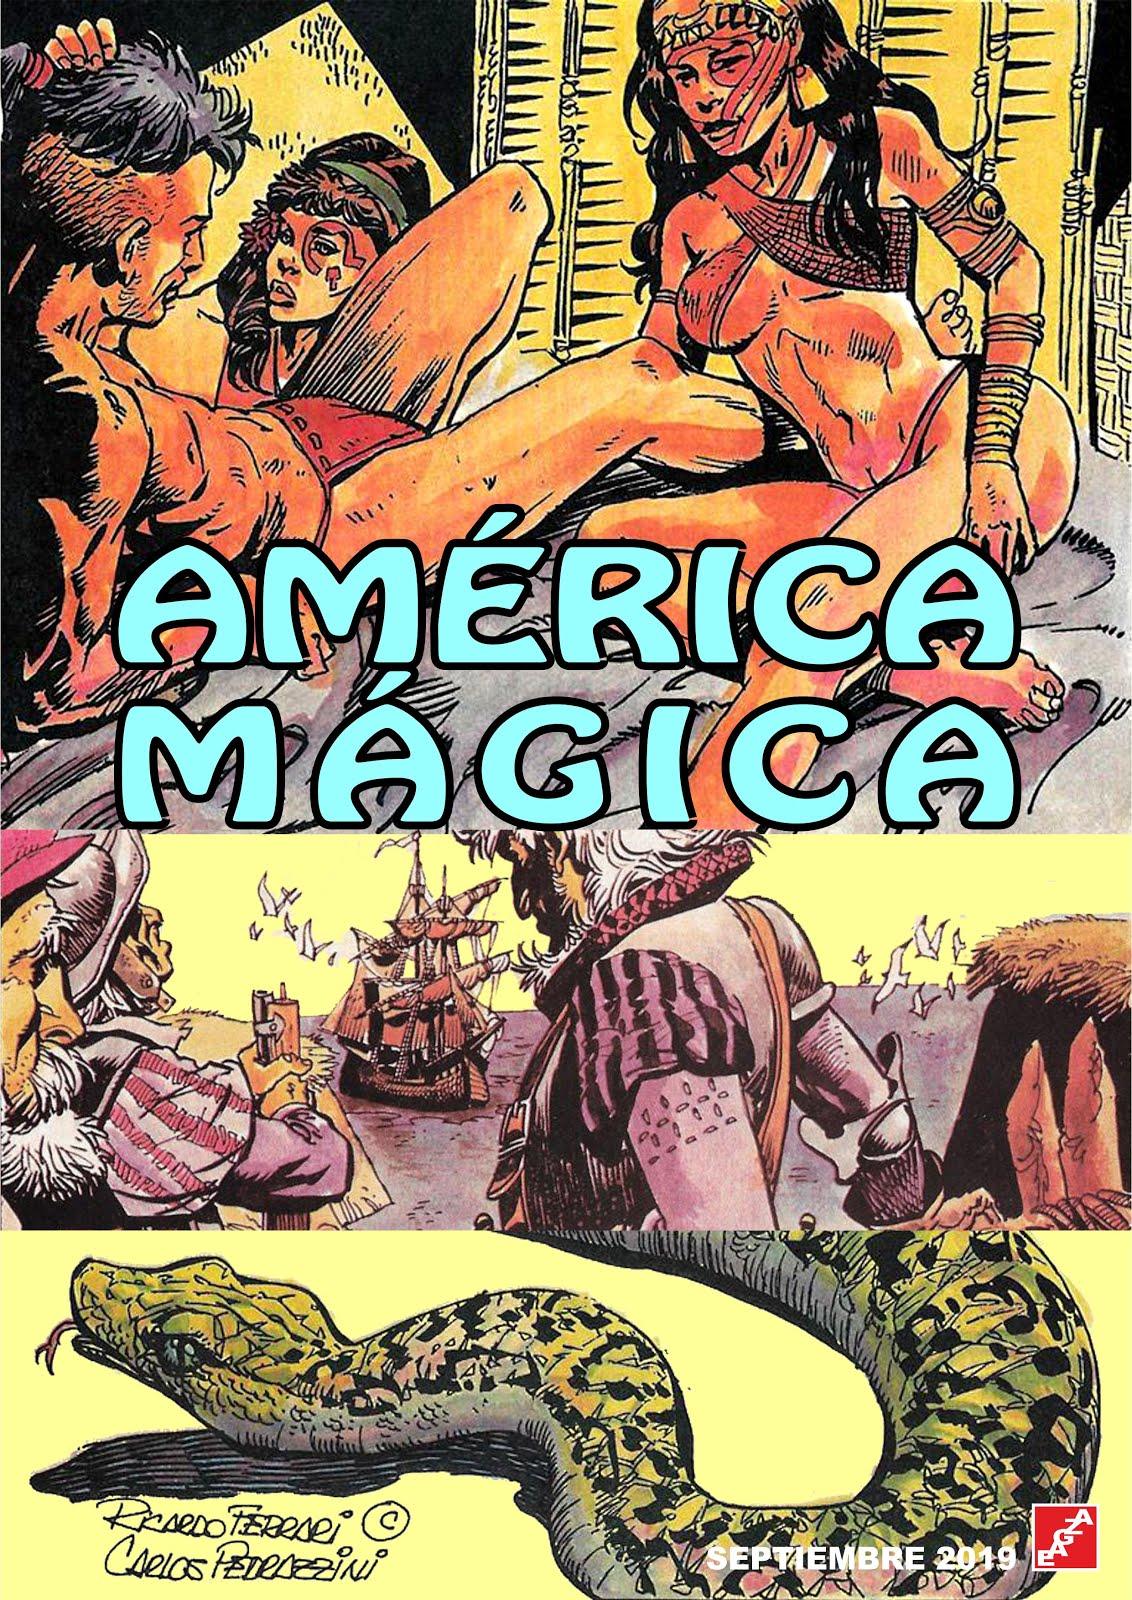 Añadida la historieta: América Mágica - R. Ferrari - C. Pedrazzini - EAGZA